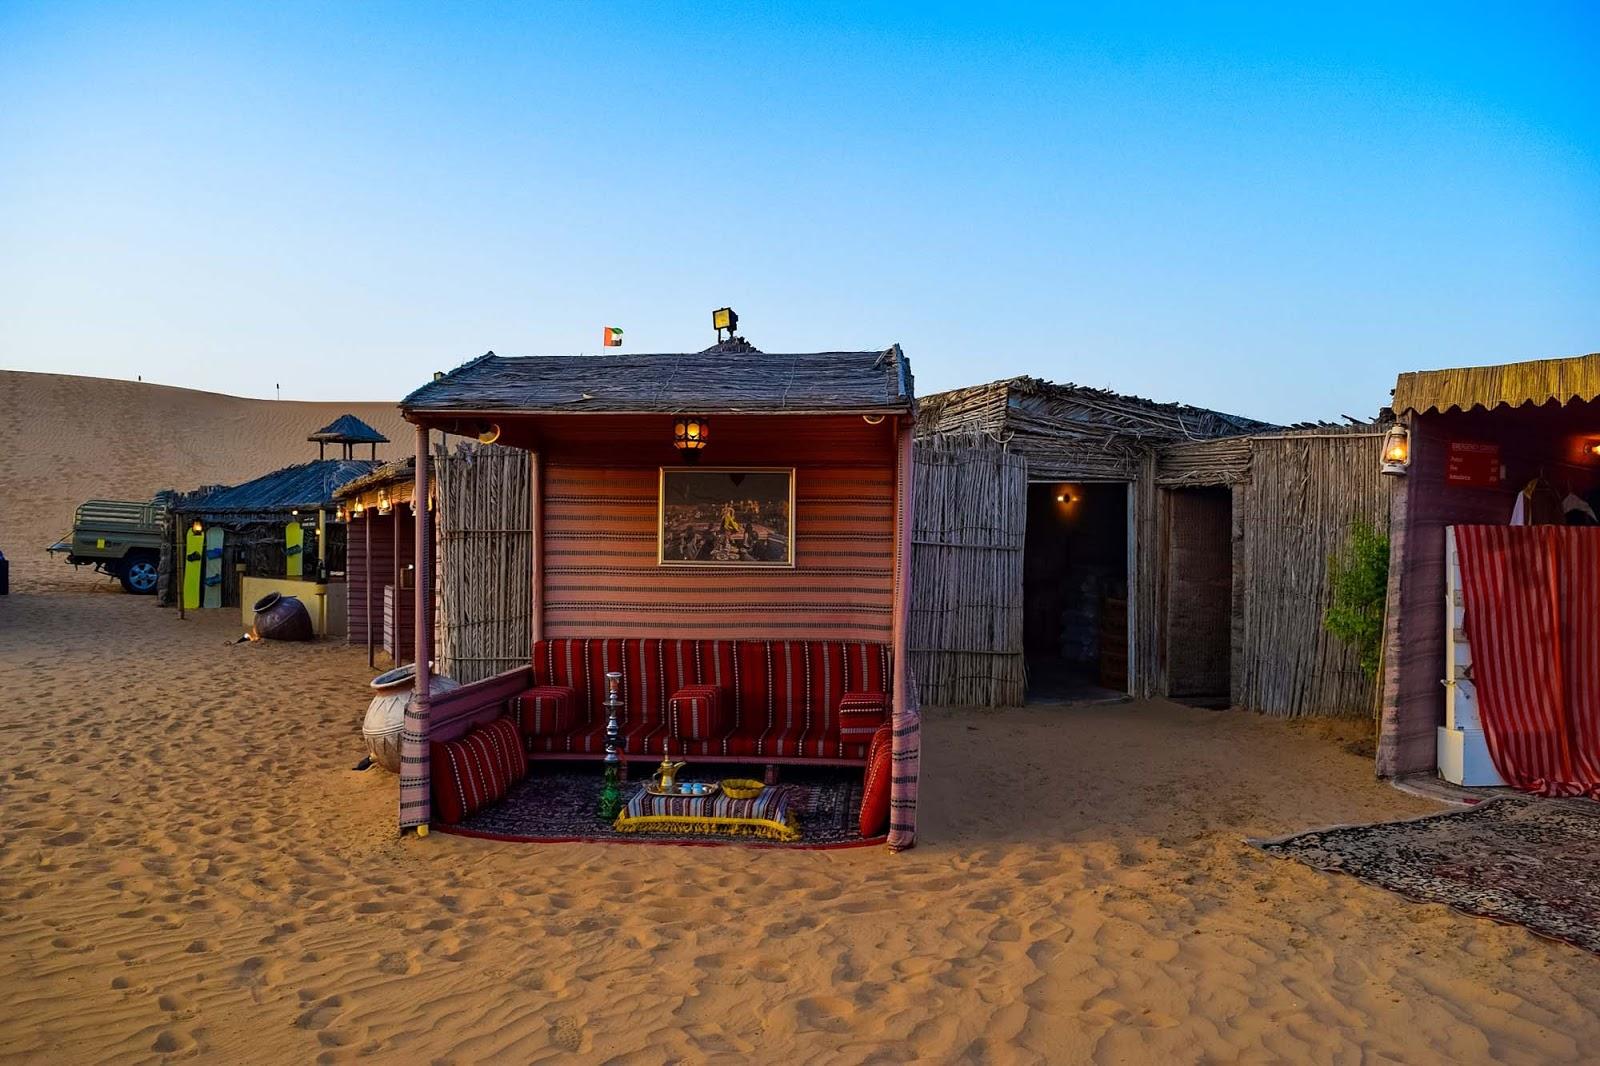 arabian desert dubai